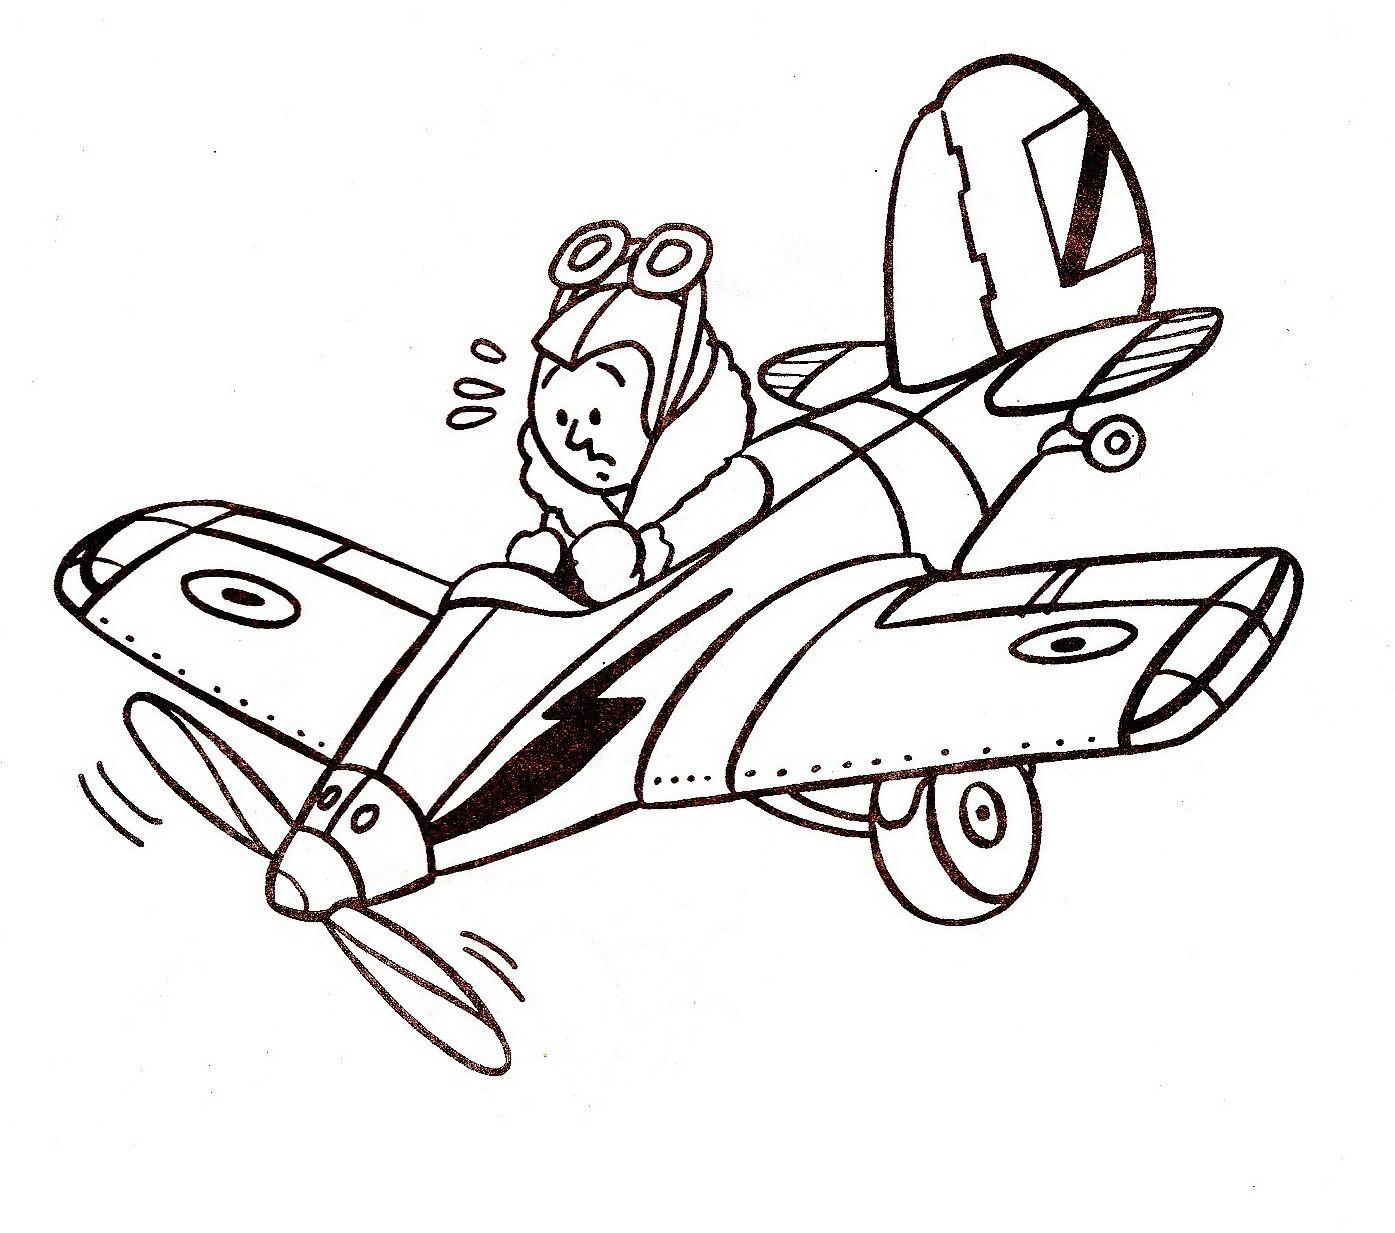 mezzi_trasporto/aerei/aereo.jpg